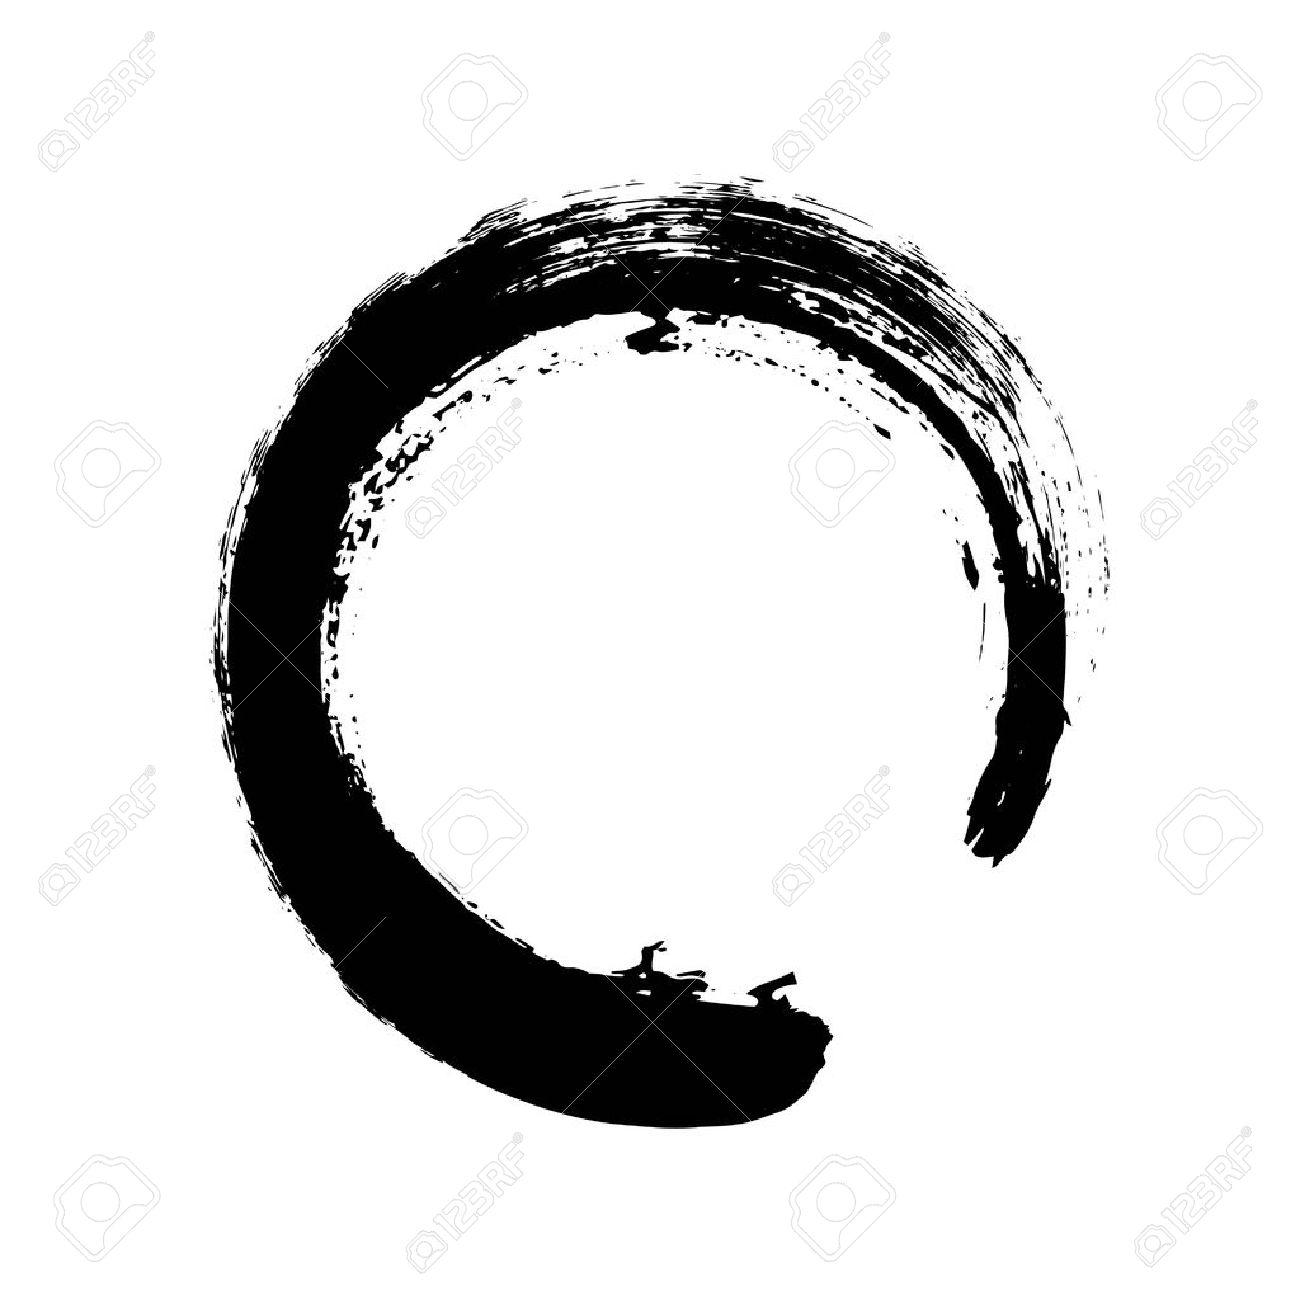 Hand drawn circle shape circular label design element frame hand drawn circle shape circular label design element frame brush abstract wave biocorpaavc Images